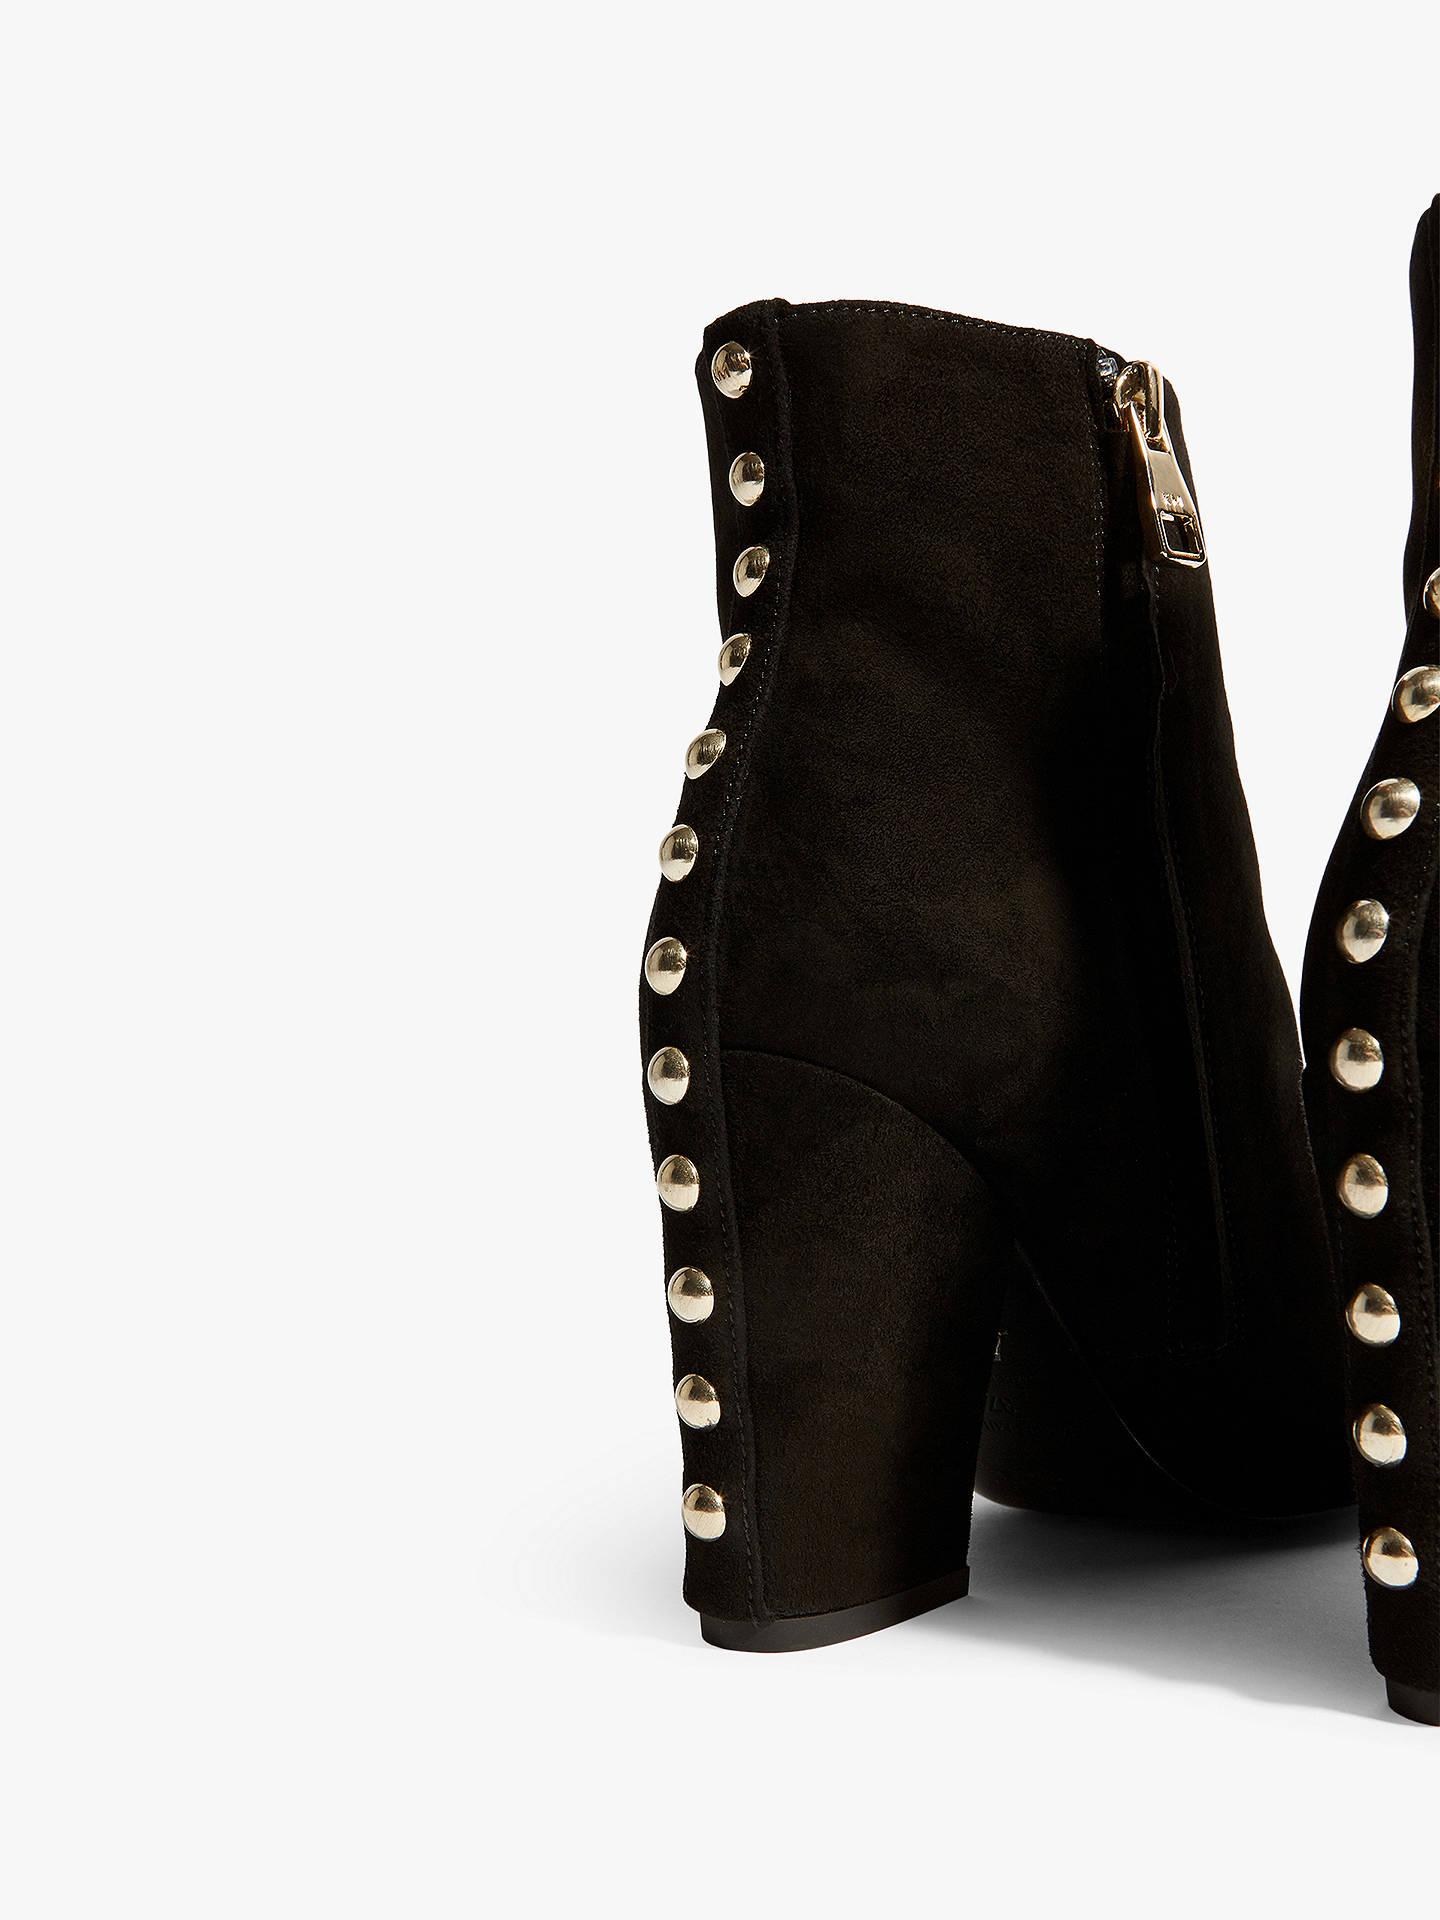 f46c1d19b29 Karen Millen Studded Block Heel Ankle Boots, Black Leather